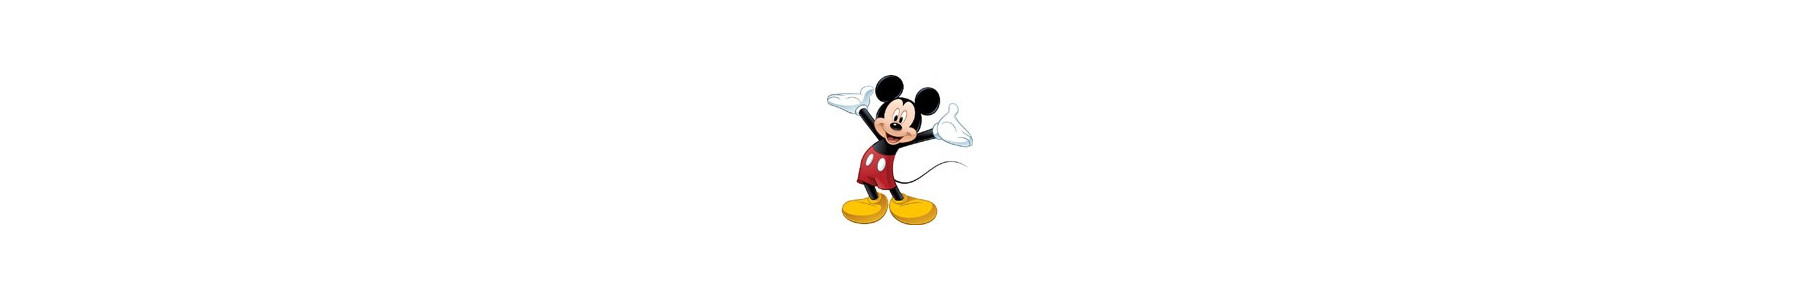 Lumanari Mickey Mouse